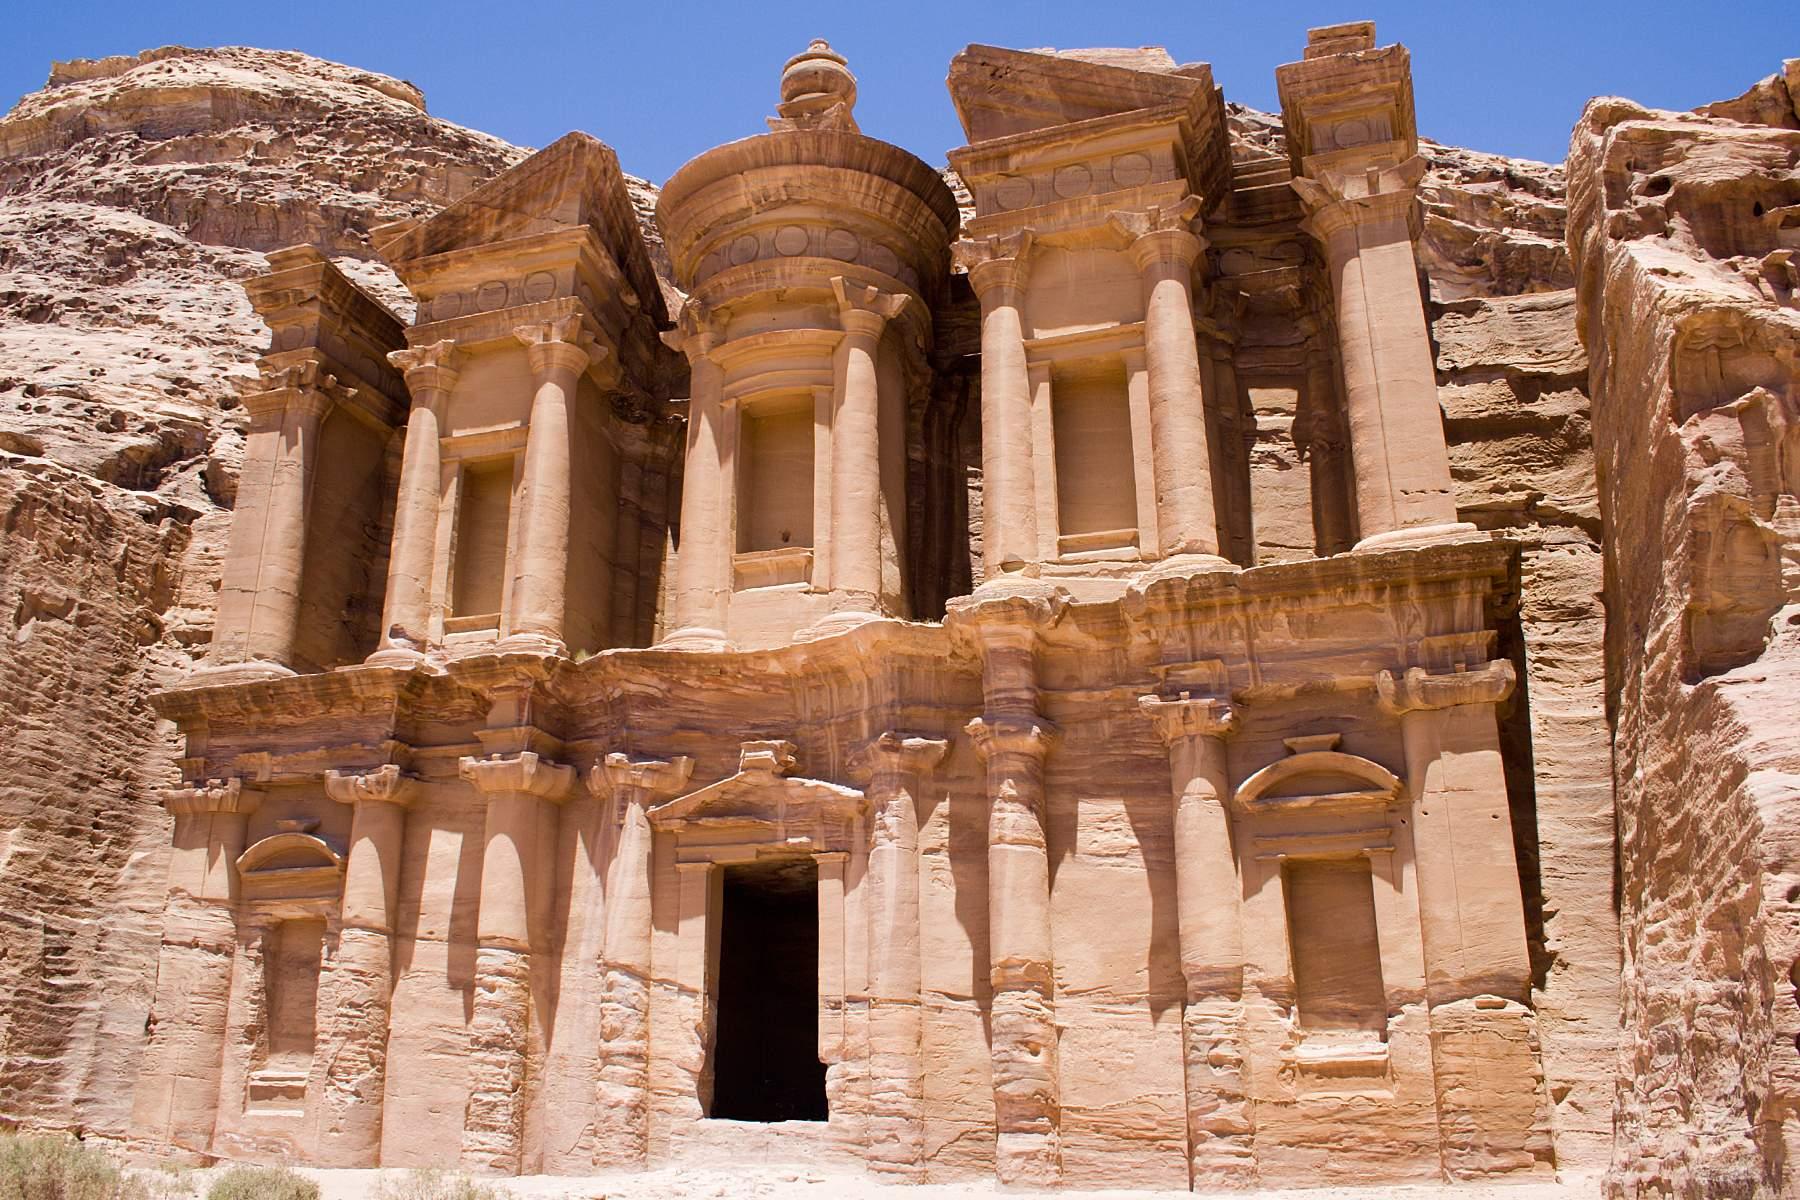 Petra-Jordanien Ausflug ab Aqaba Hafen